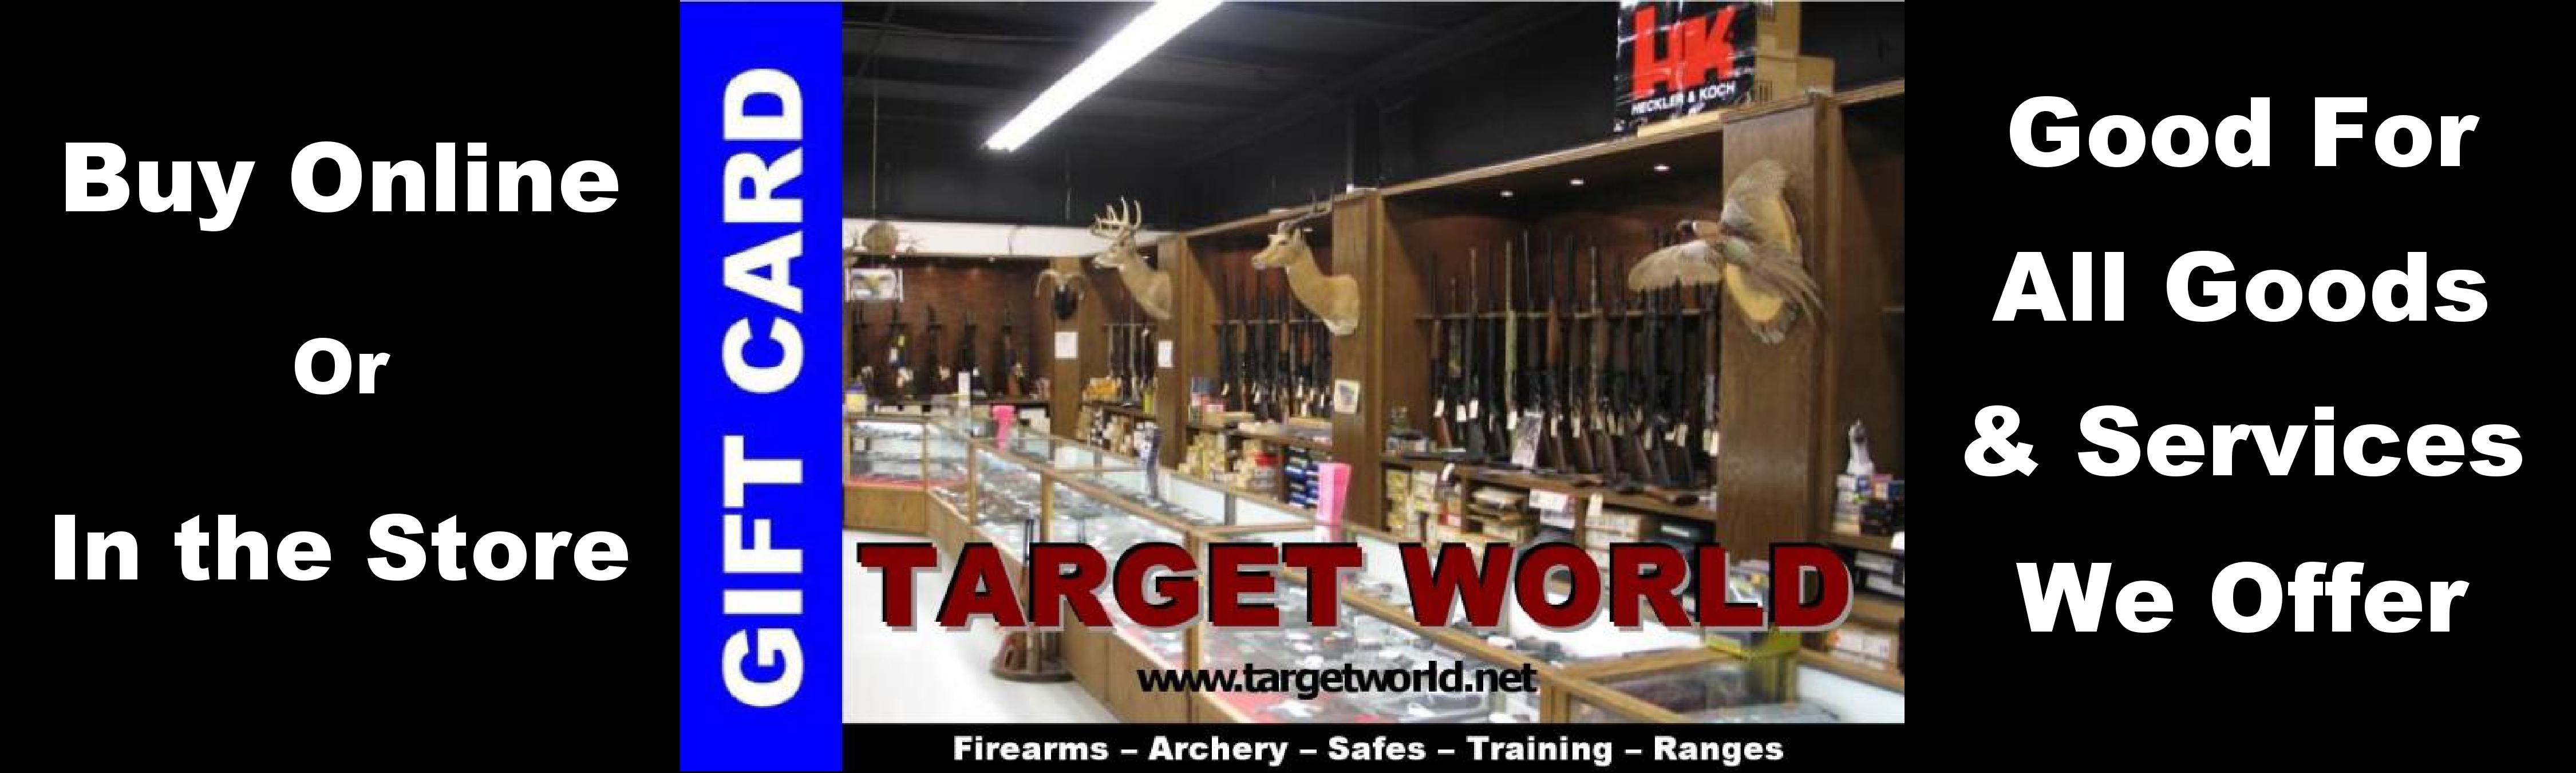 target-world-2